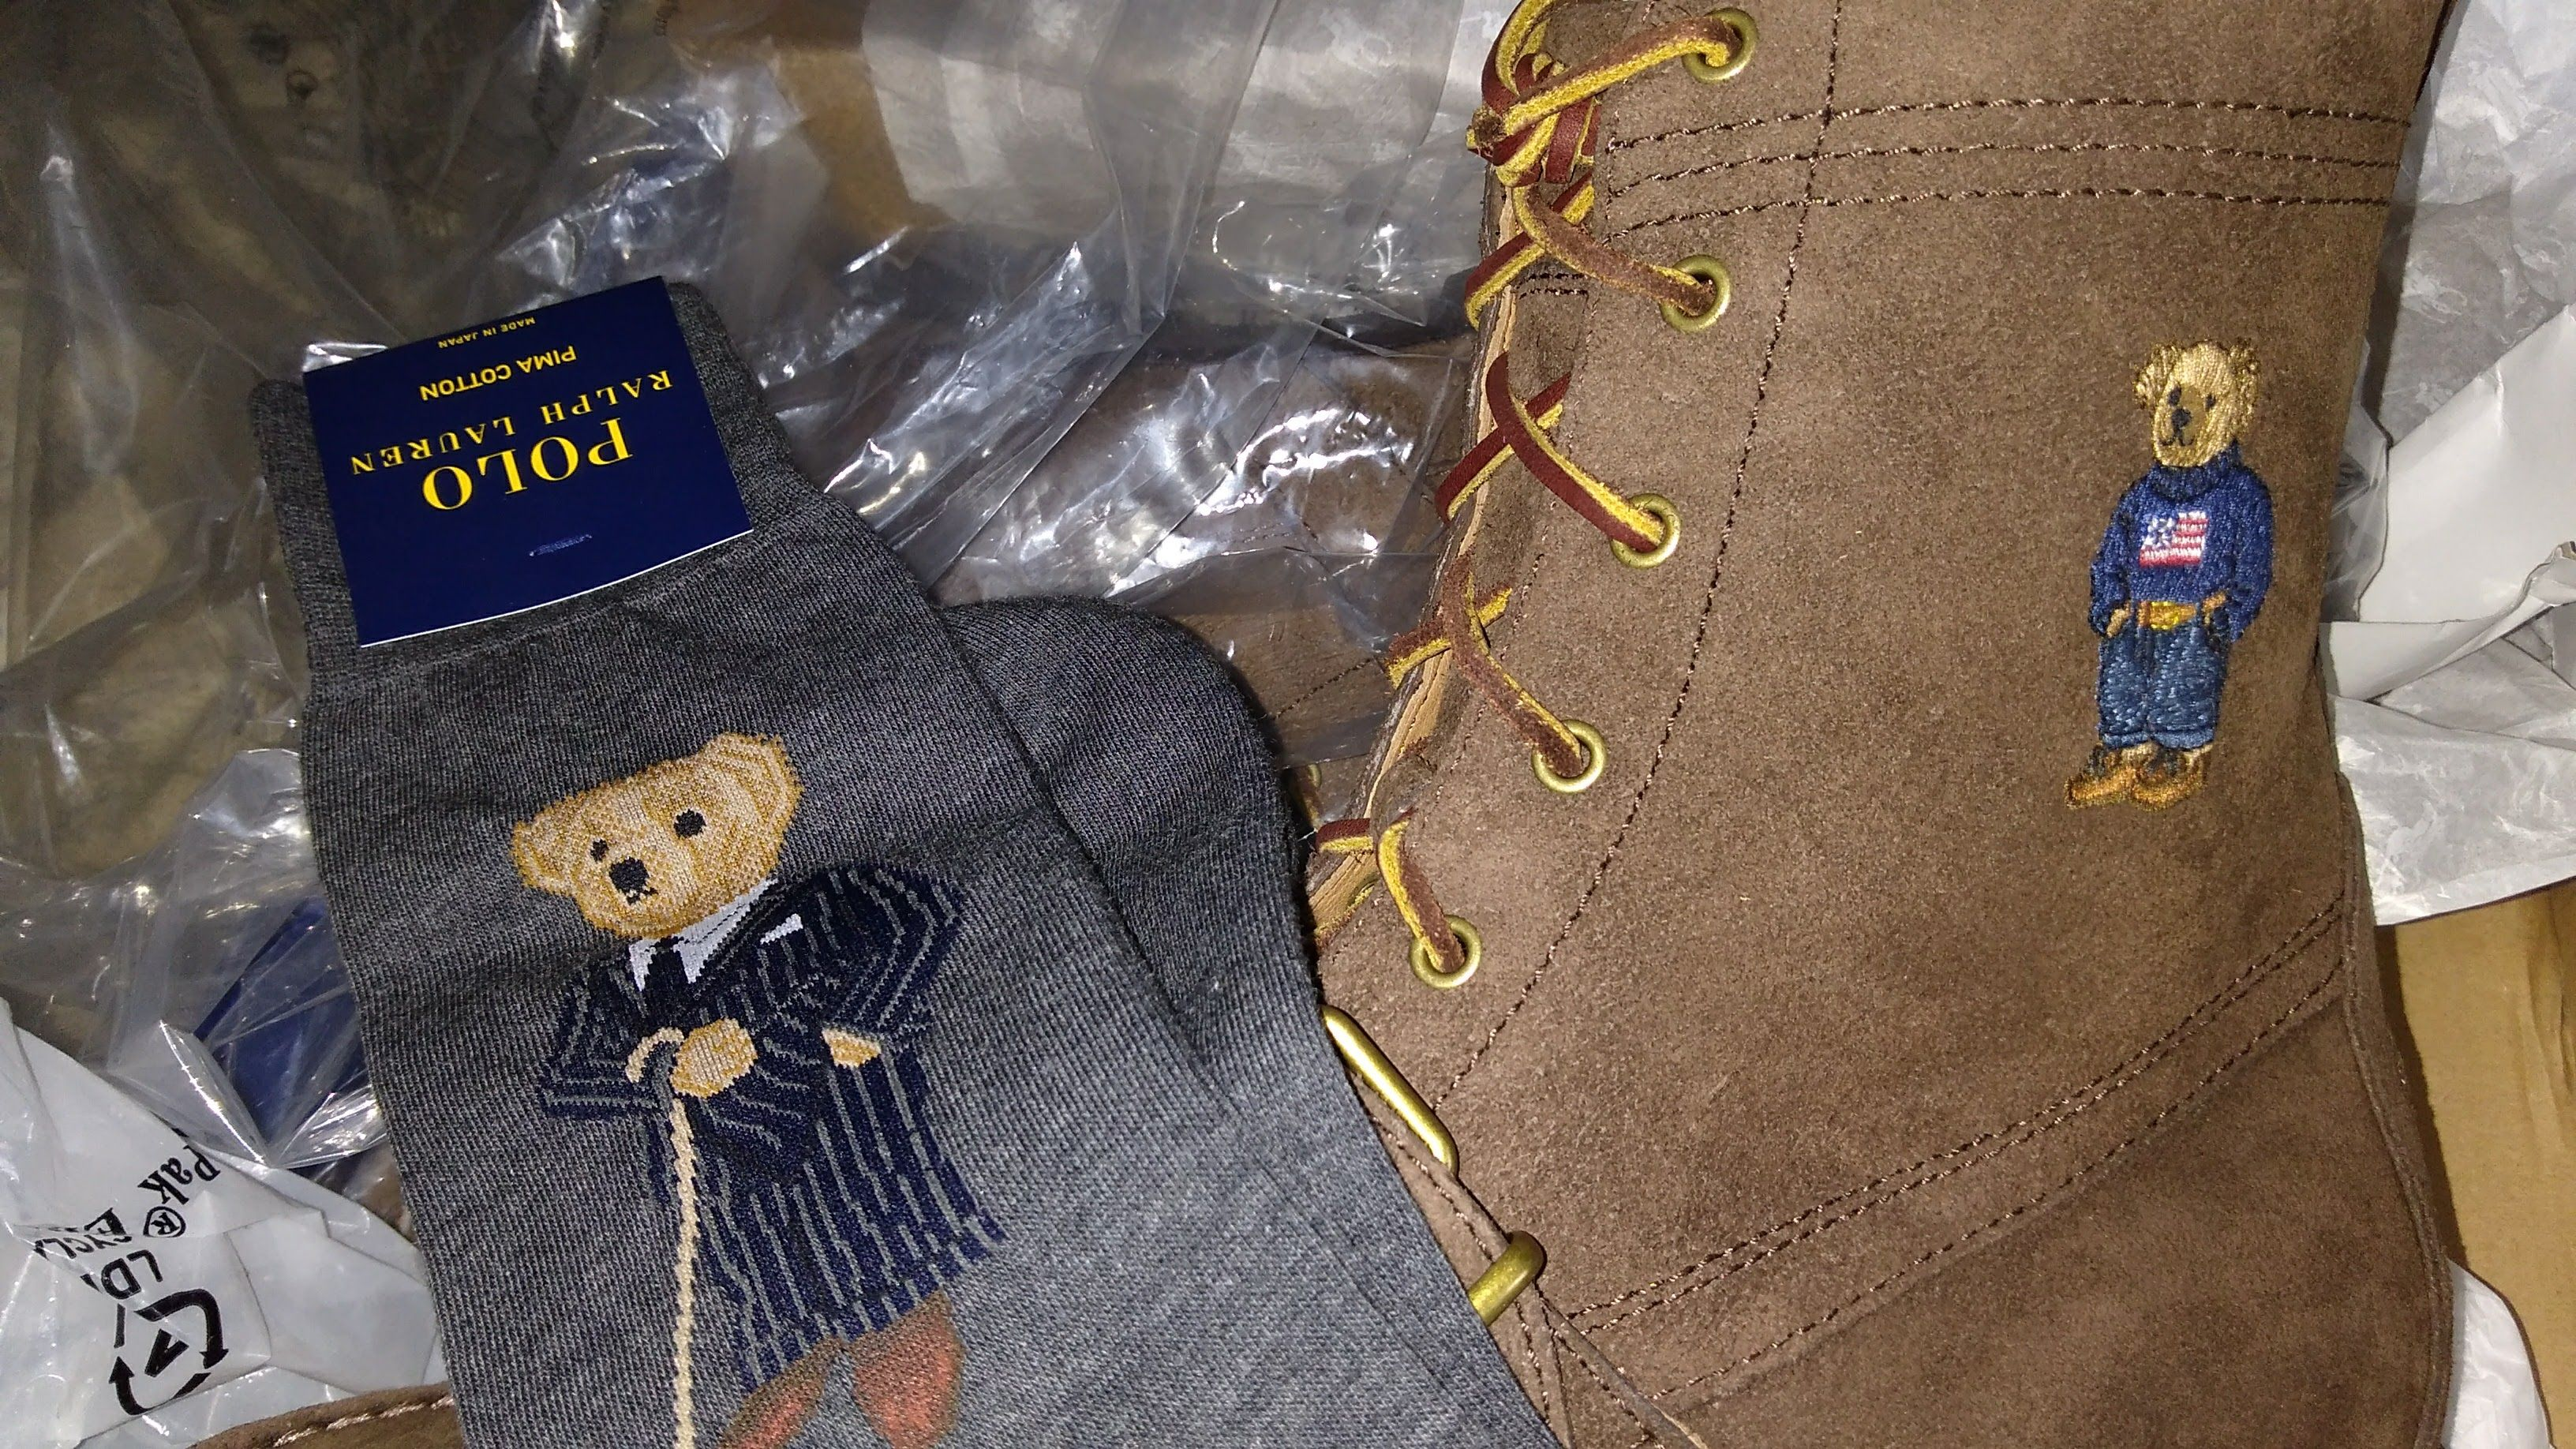 #footwear by #RalphLauren of #Polo - https://drewrynewsnetwork.com/forum/shoe-reviews